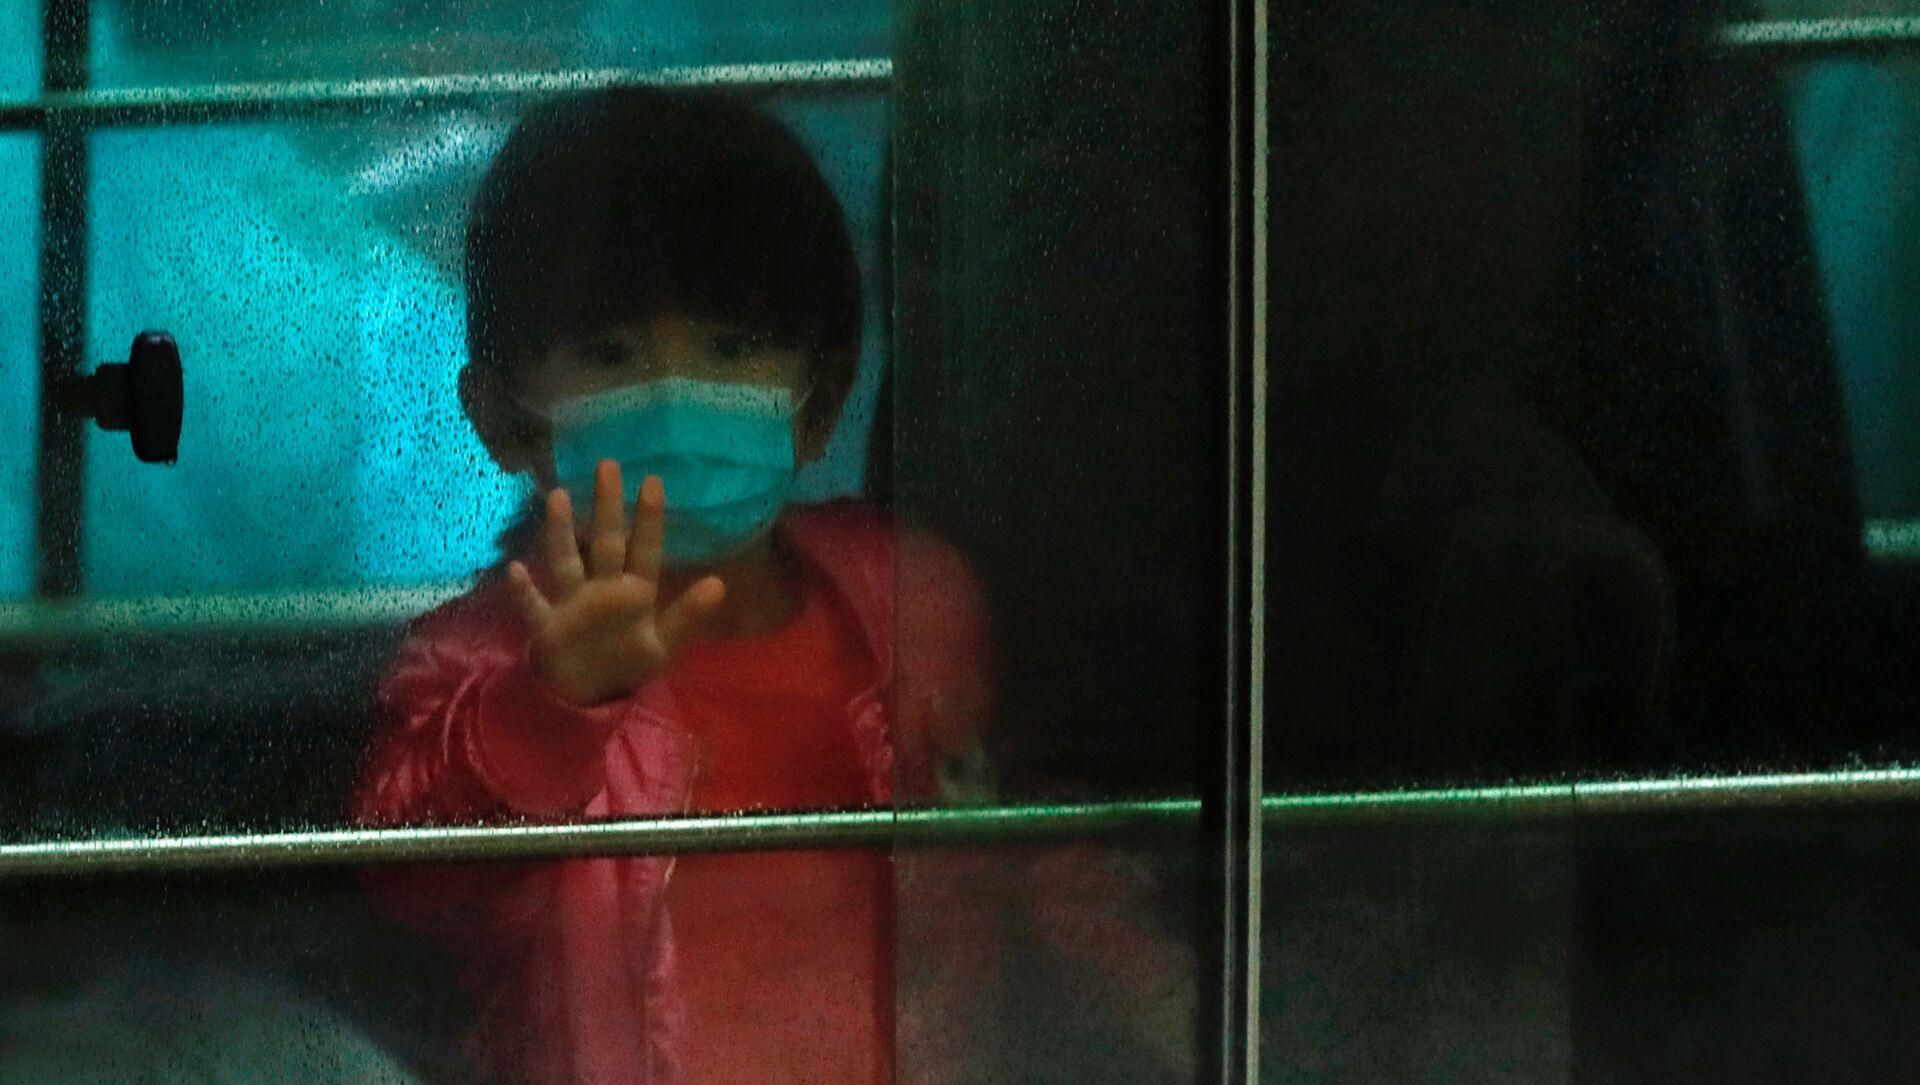 Trẻ em trong mặt nạ y tế - Sputnik Việt Nam, 1920, 13.08.2021